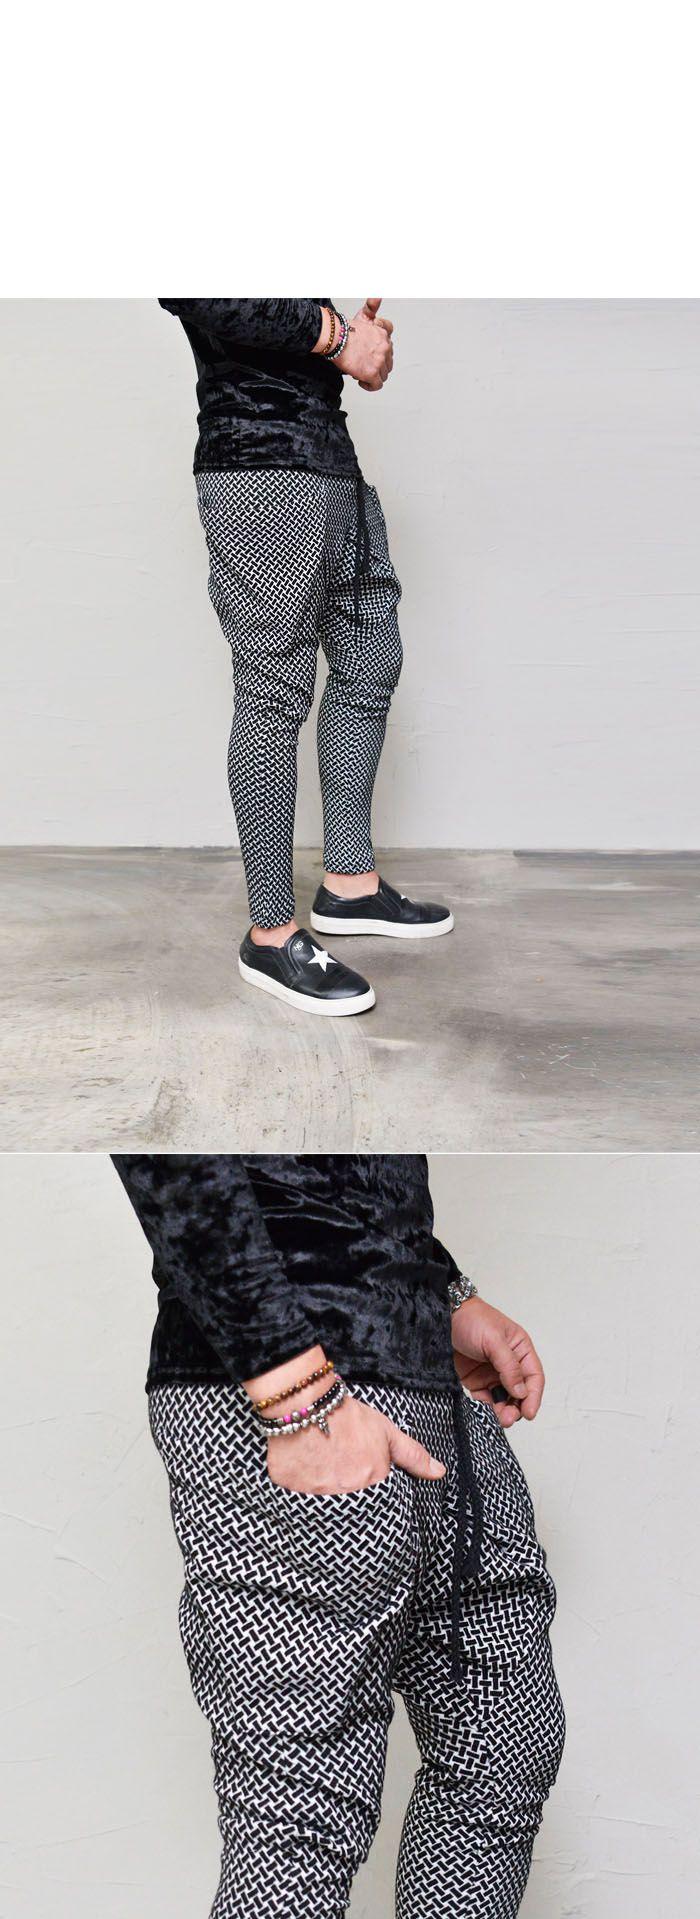 Big Pocket Jacquard Baggy-Sweatpants 317 - GUYLOOK